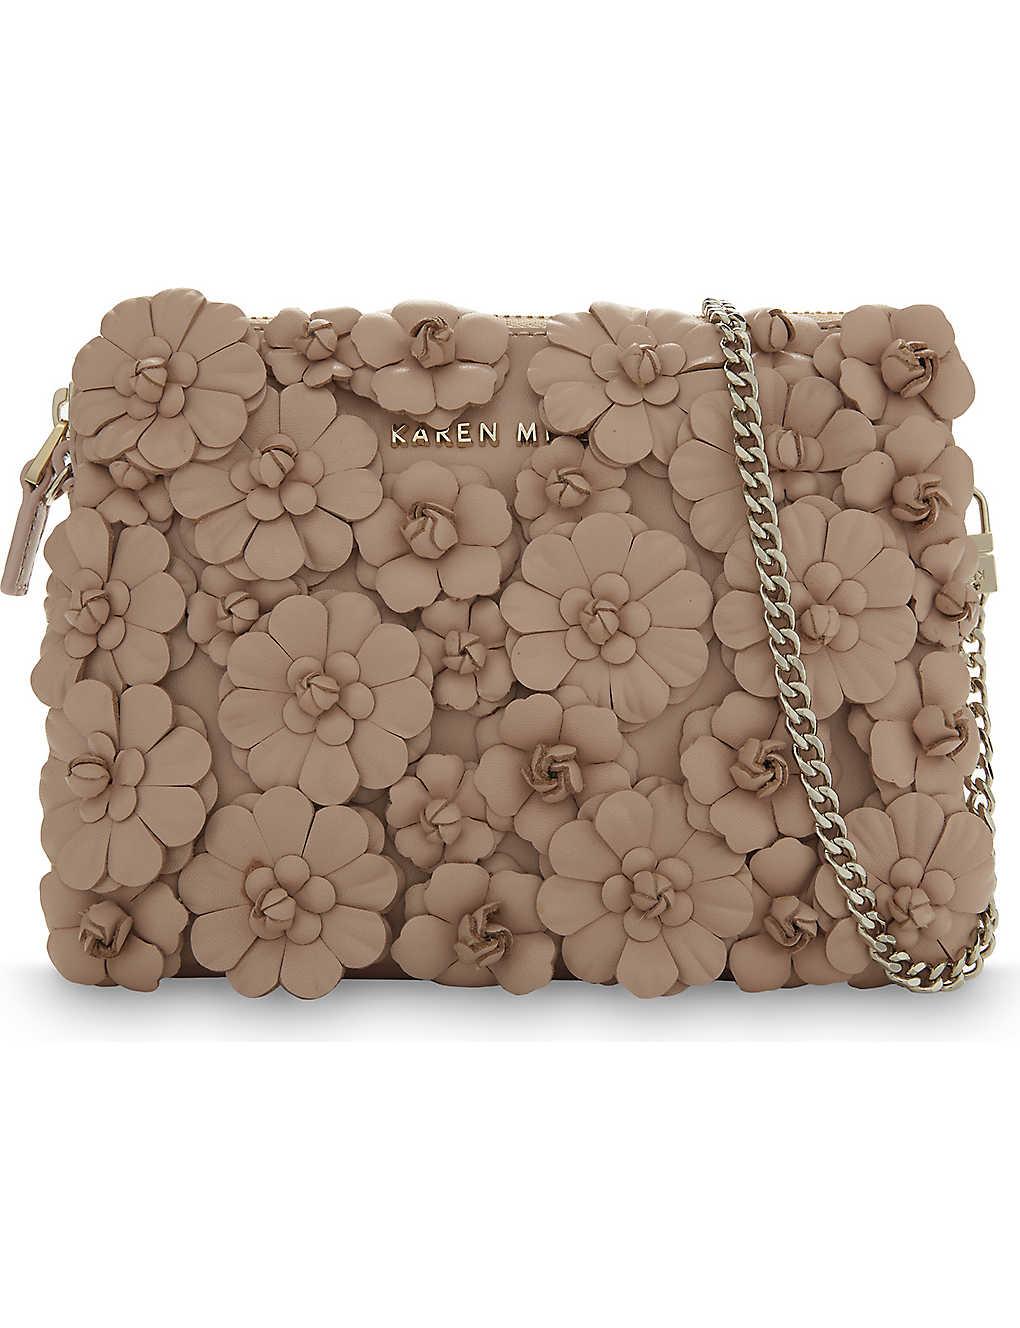 54b80638d87d KAREN MILLEN - Floral leather clutch | Selfridges.com